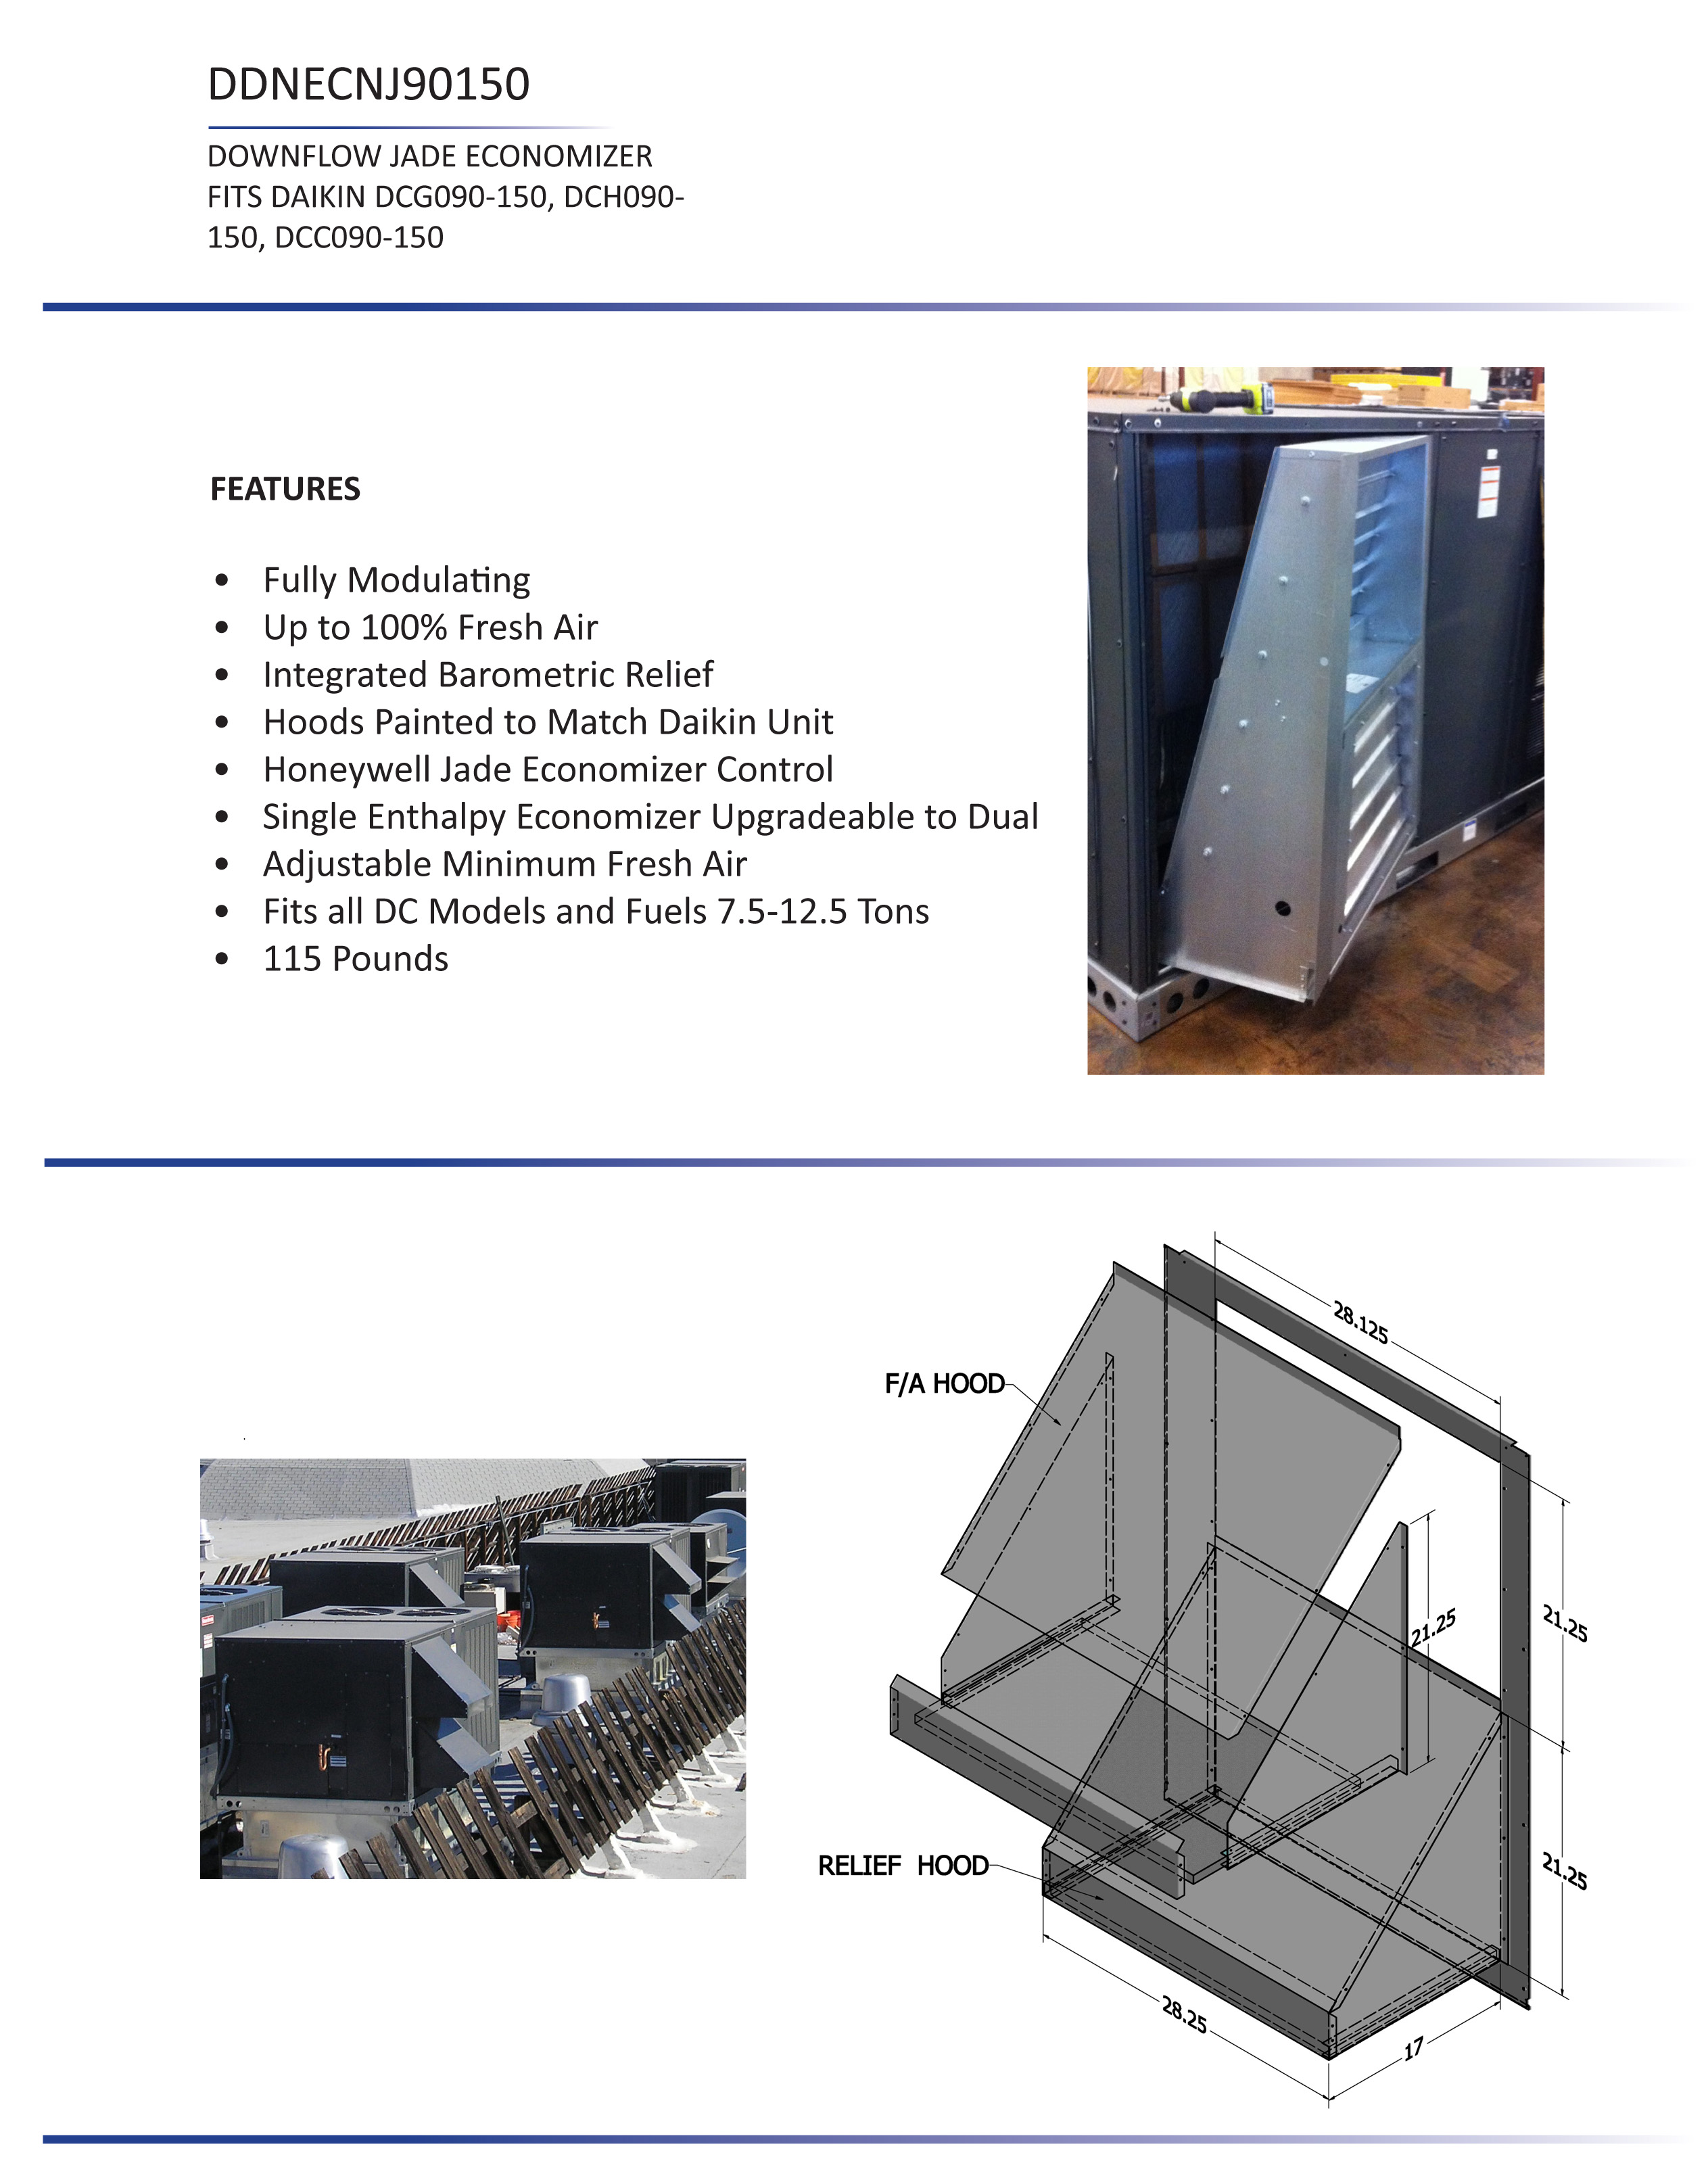 7 5 12 5 ton daikin downflow economizer dcc dcg dch models rh budgetheating com Air-Handler Wiring Diagram Daikin Mini Split Wiring-Diagram